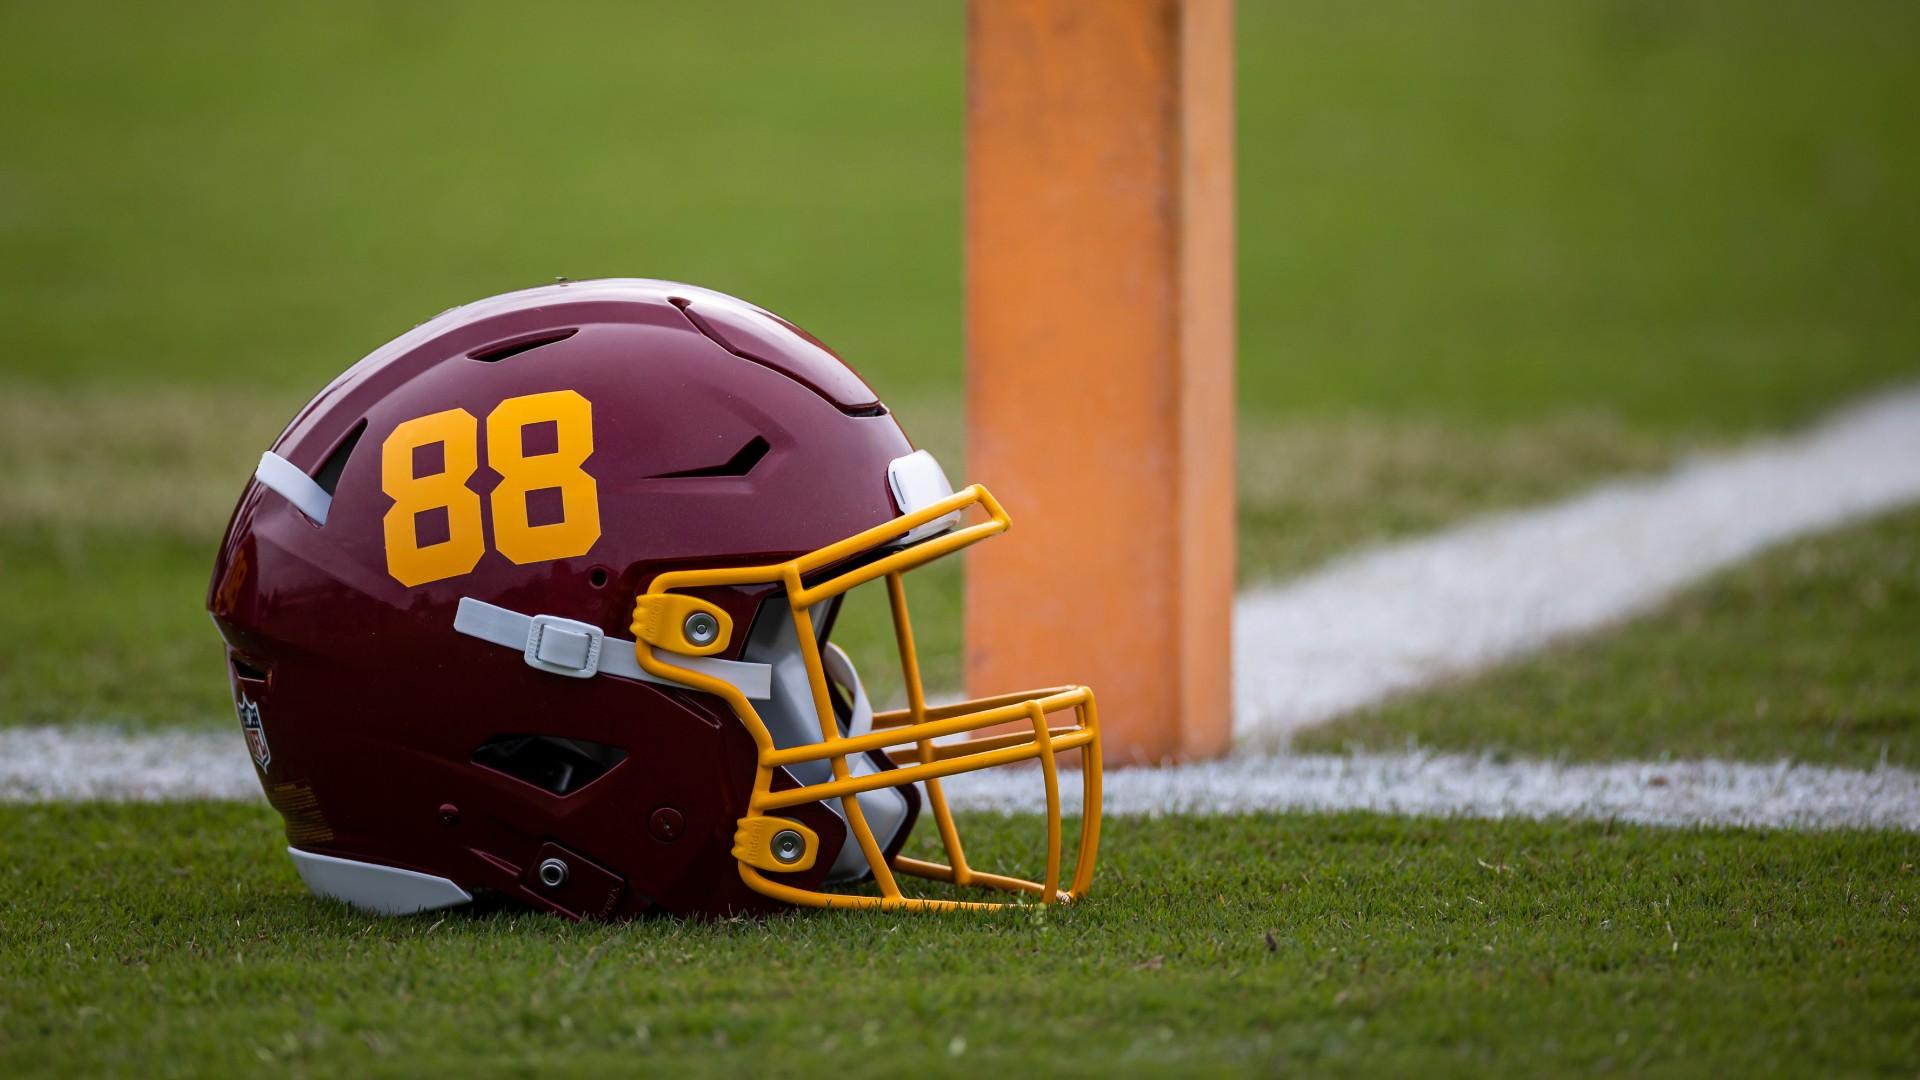 Washington-Football-Team-Helmet-070121-GETTY-FTR